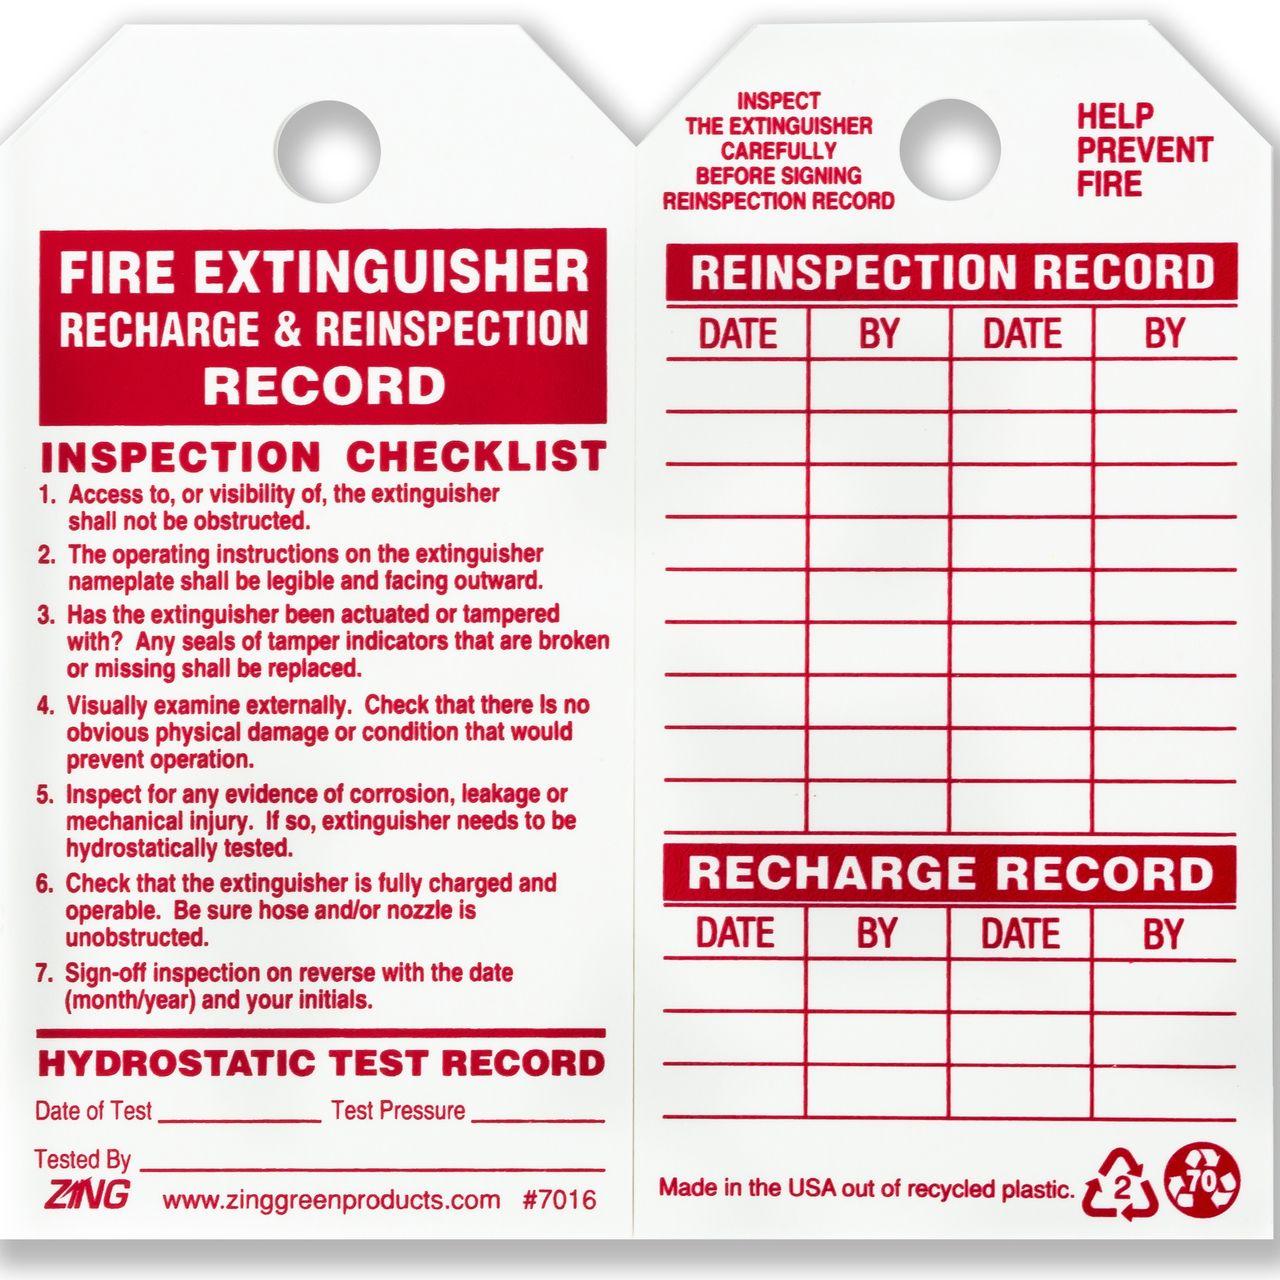 ZING 7016 Eco Safety Tag, Fire Extinguisher, 5.75Hx3W, 10